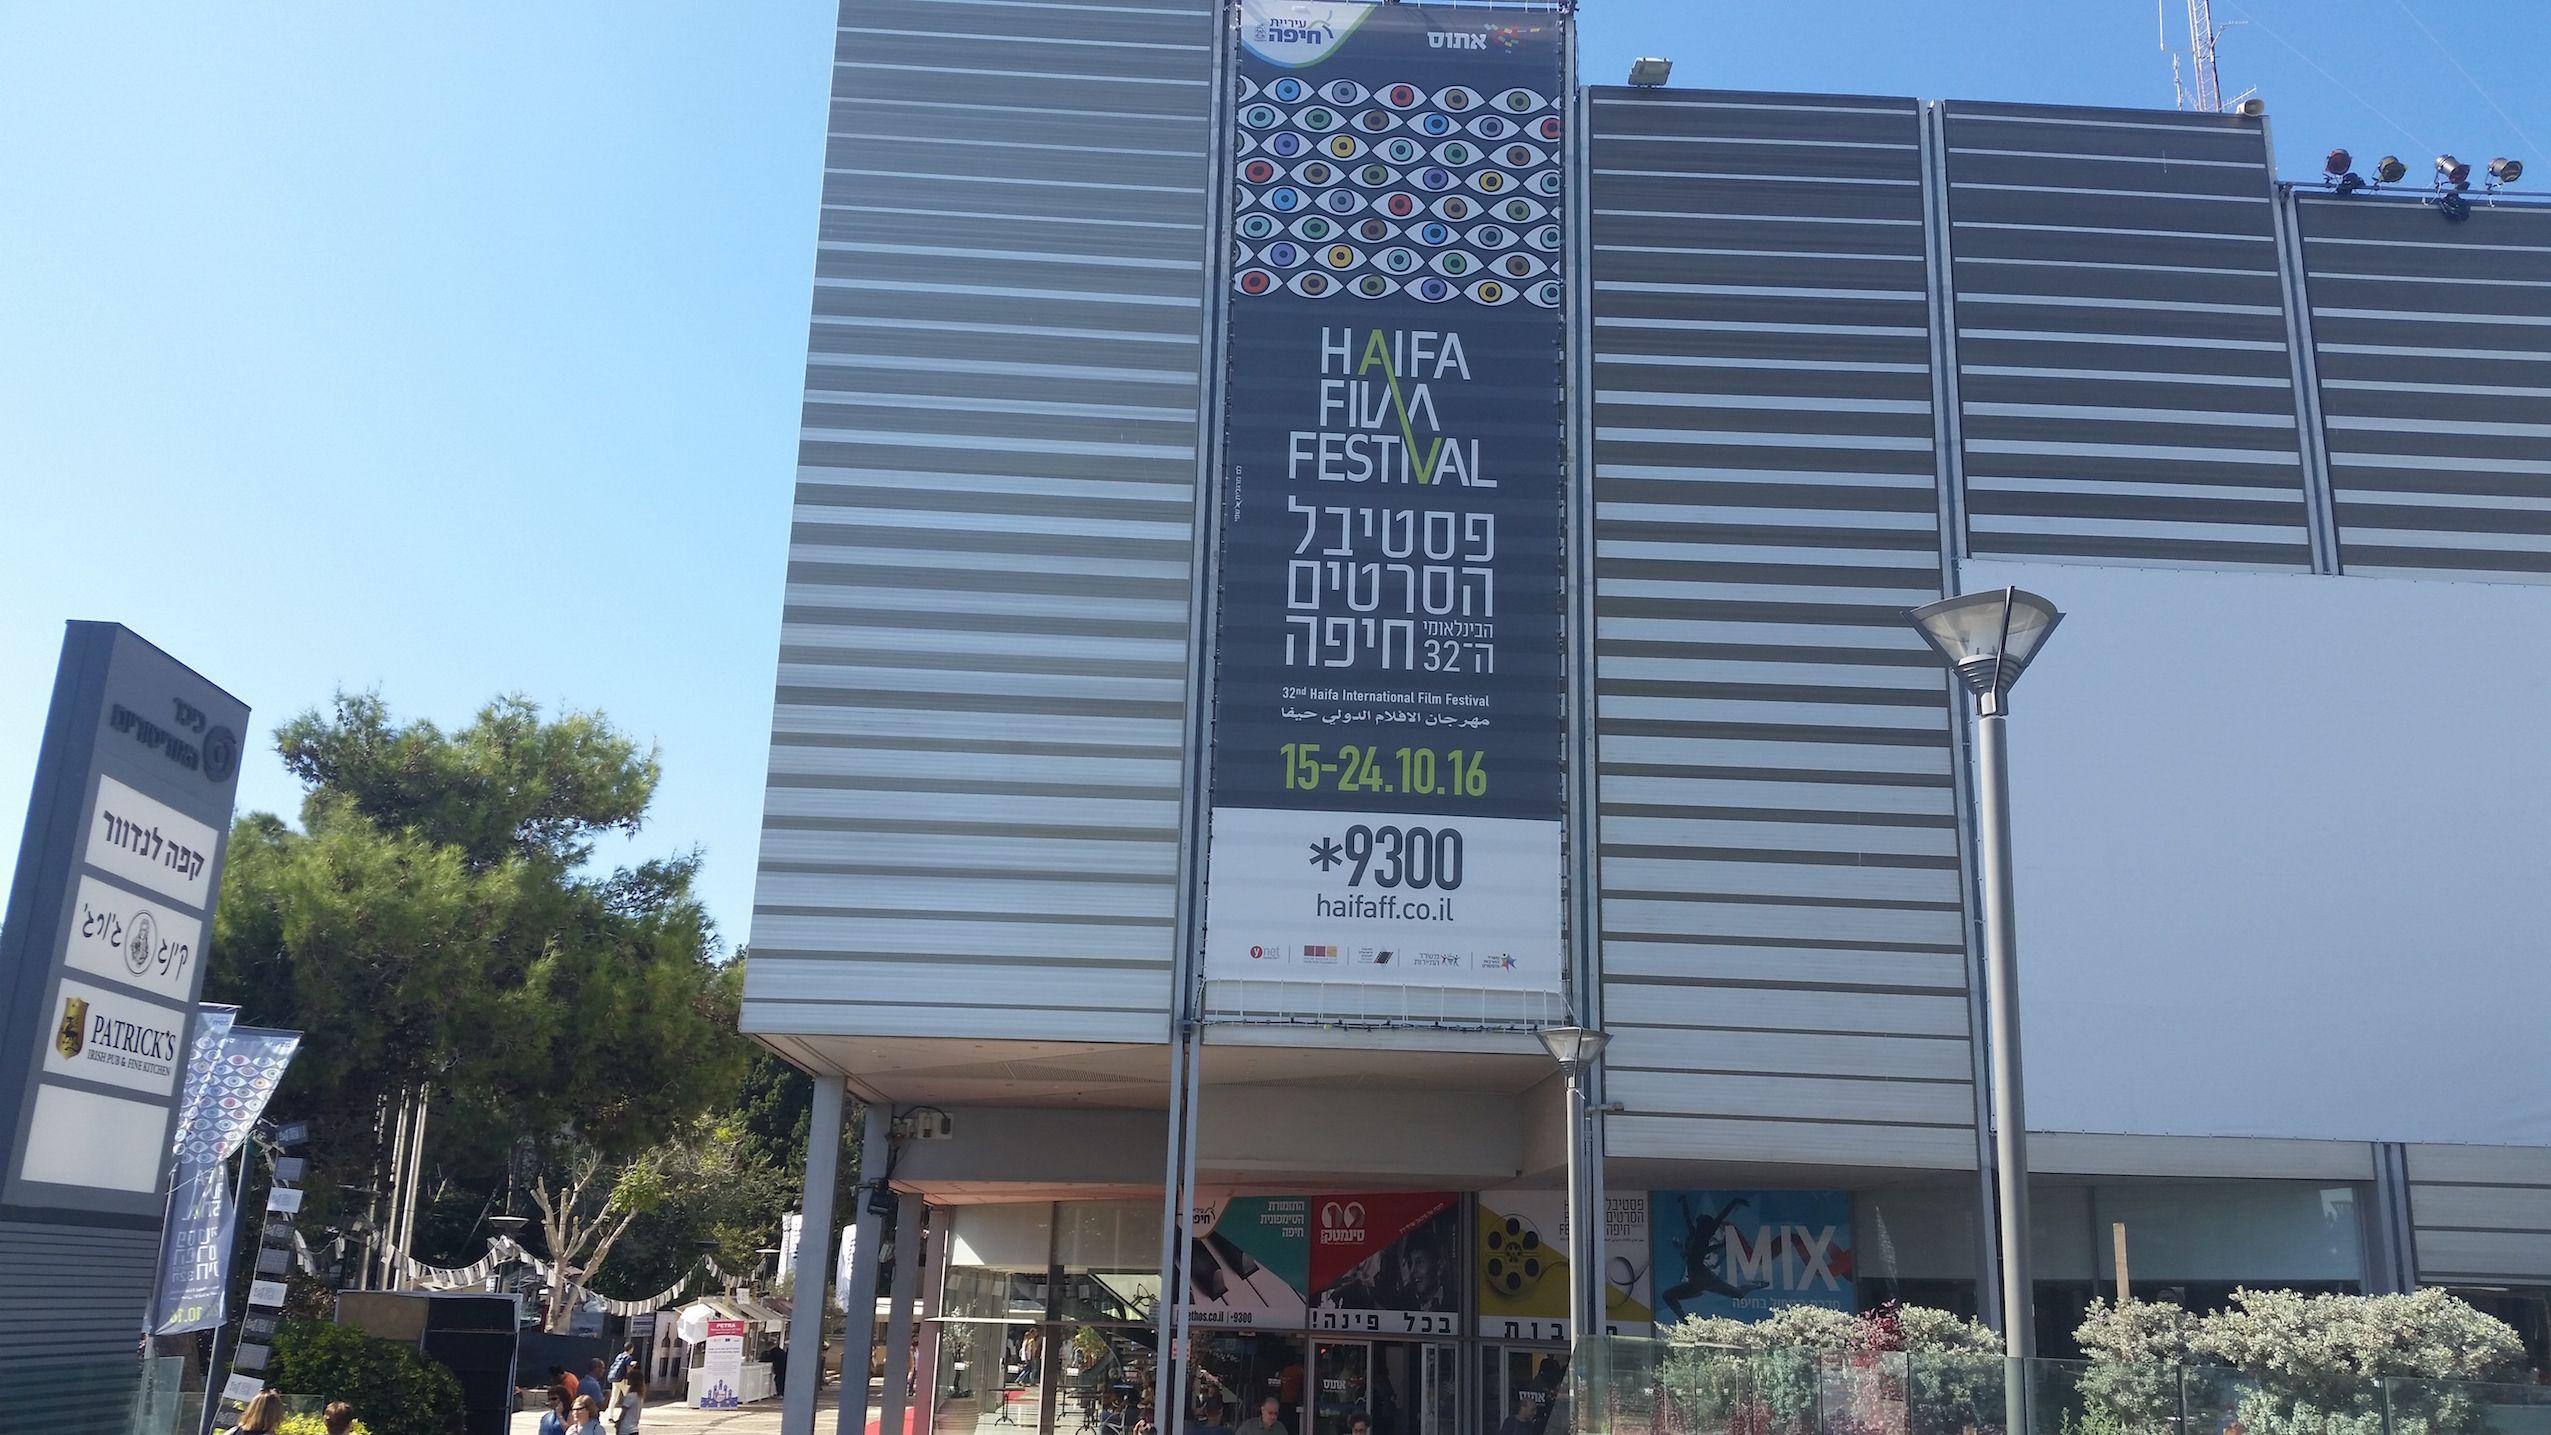 Festival du film de Haïfa